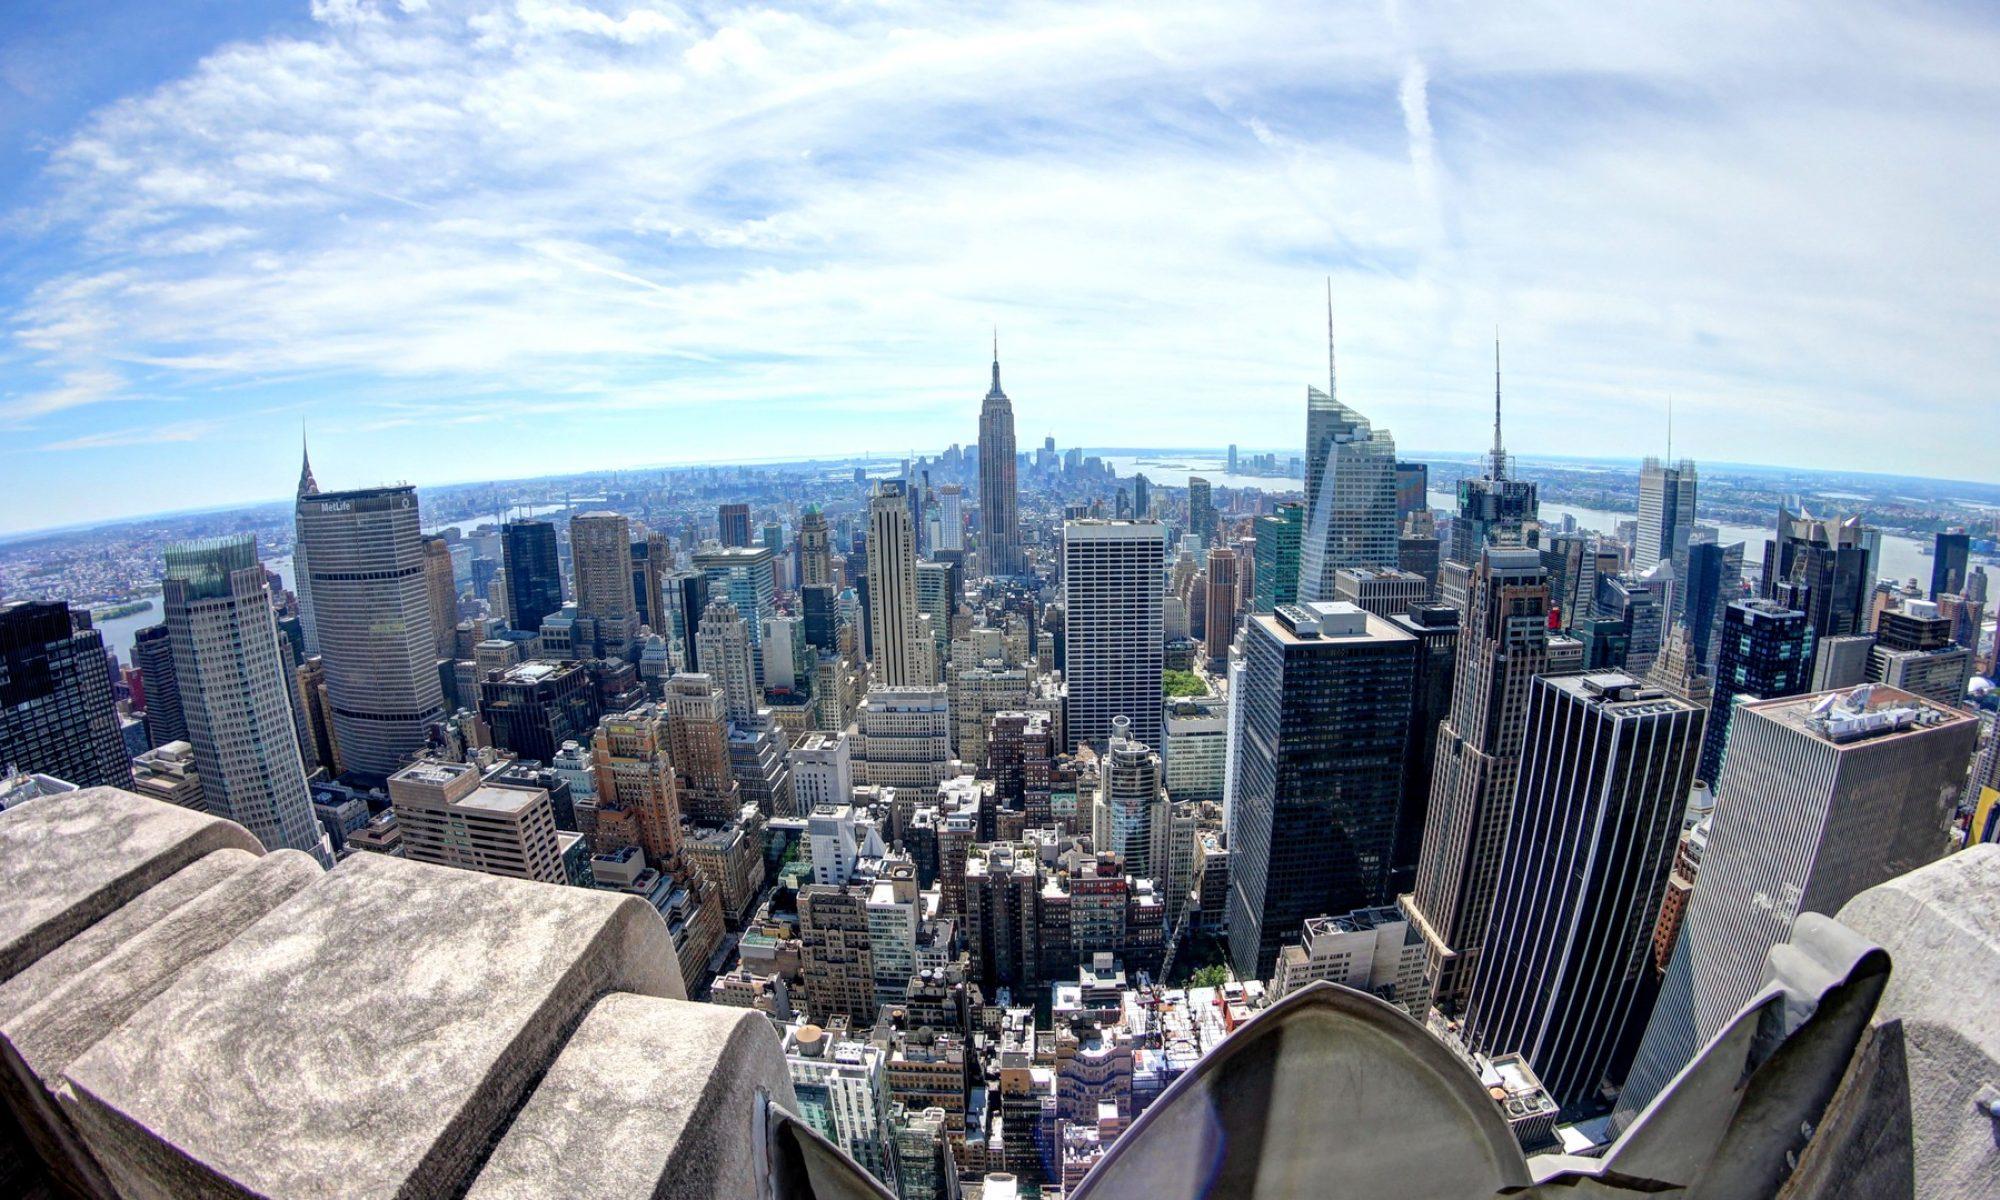 New york vs los angeles dating quora